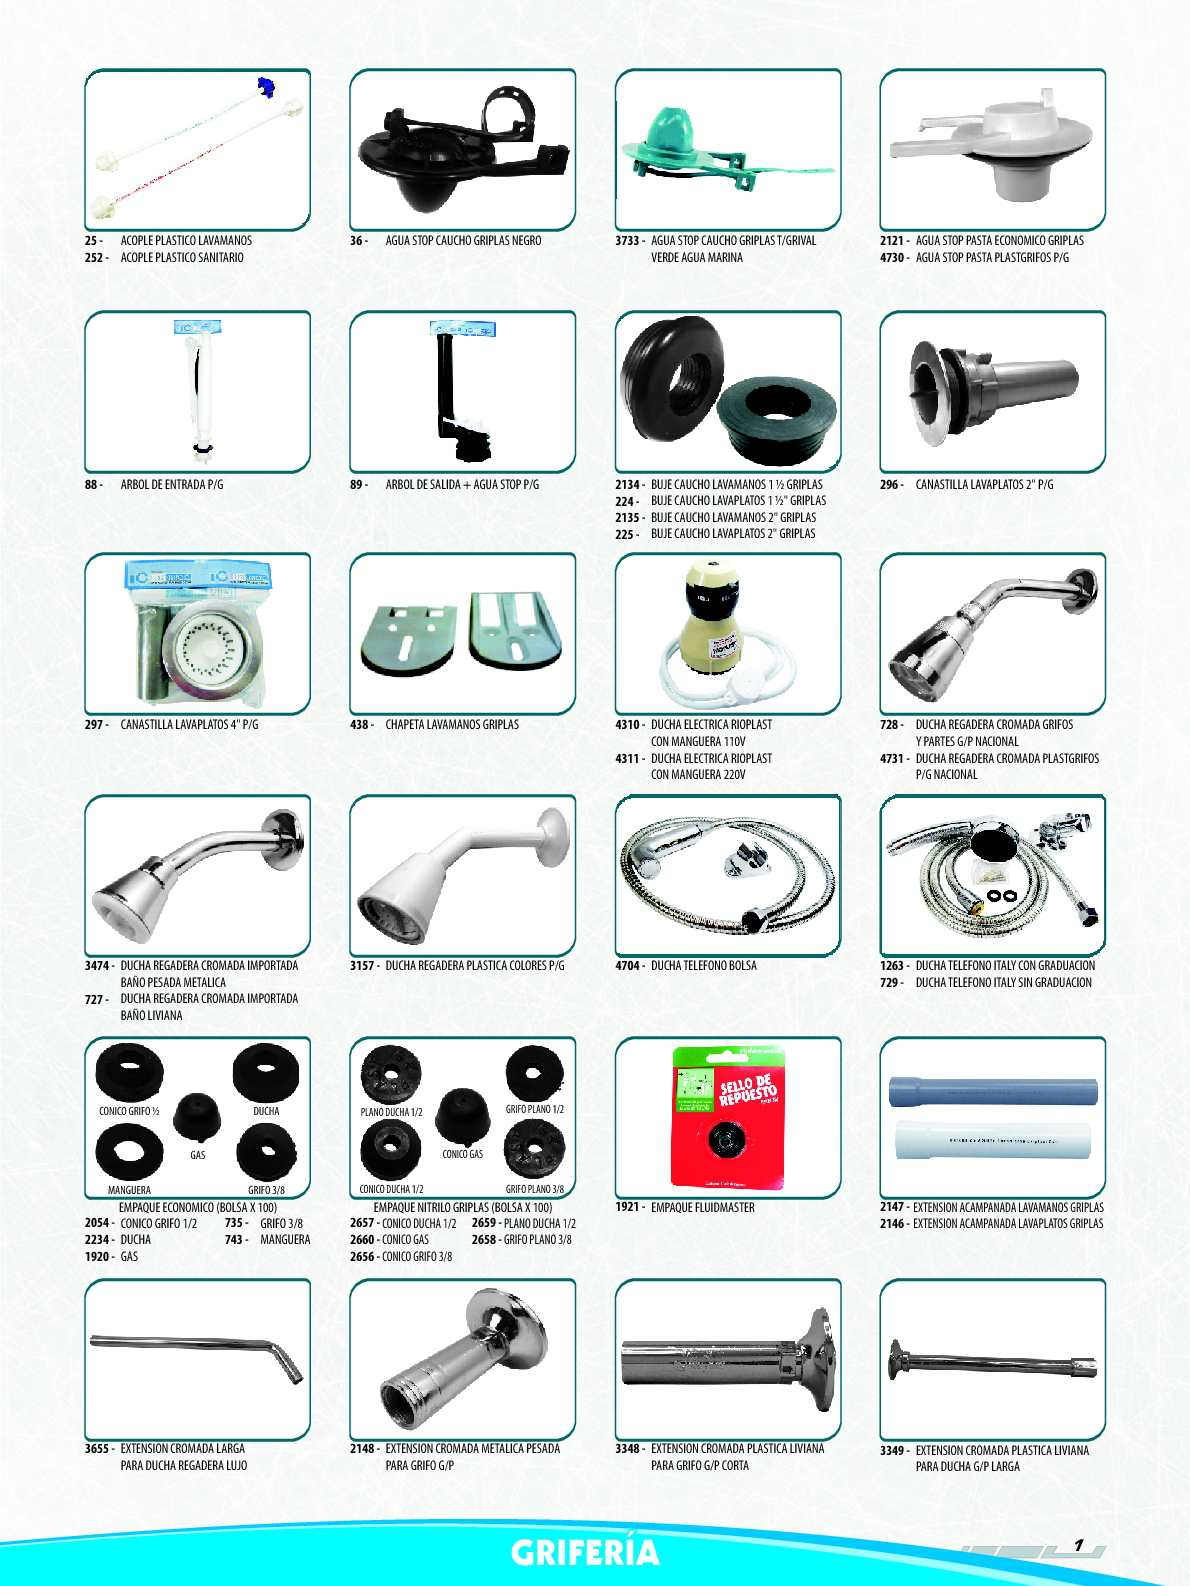 Calam o catalogo hoyos tools parte 1 for Partes de una llave de ducha